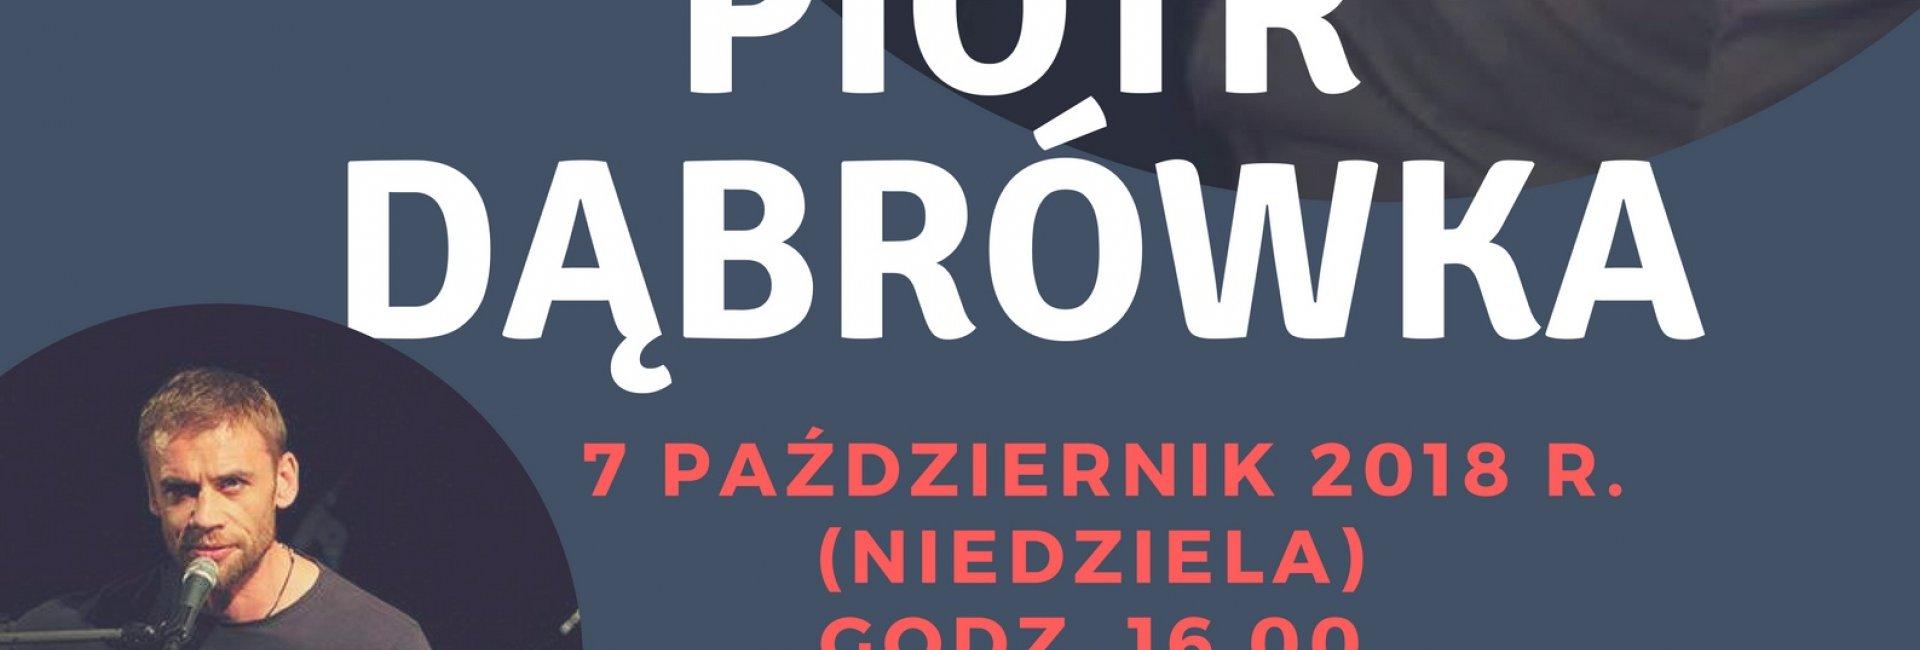 Koncert Piotra Dąbrówki